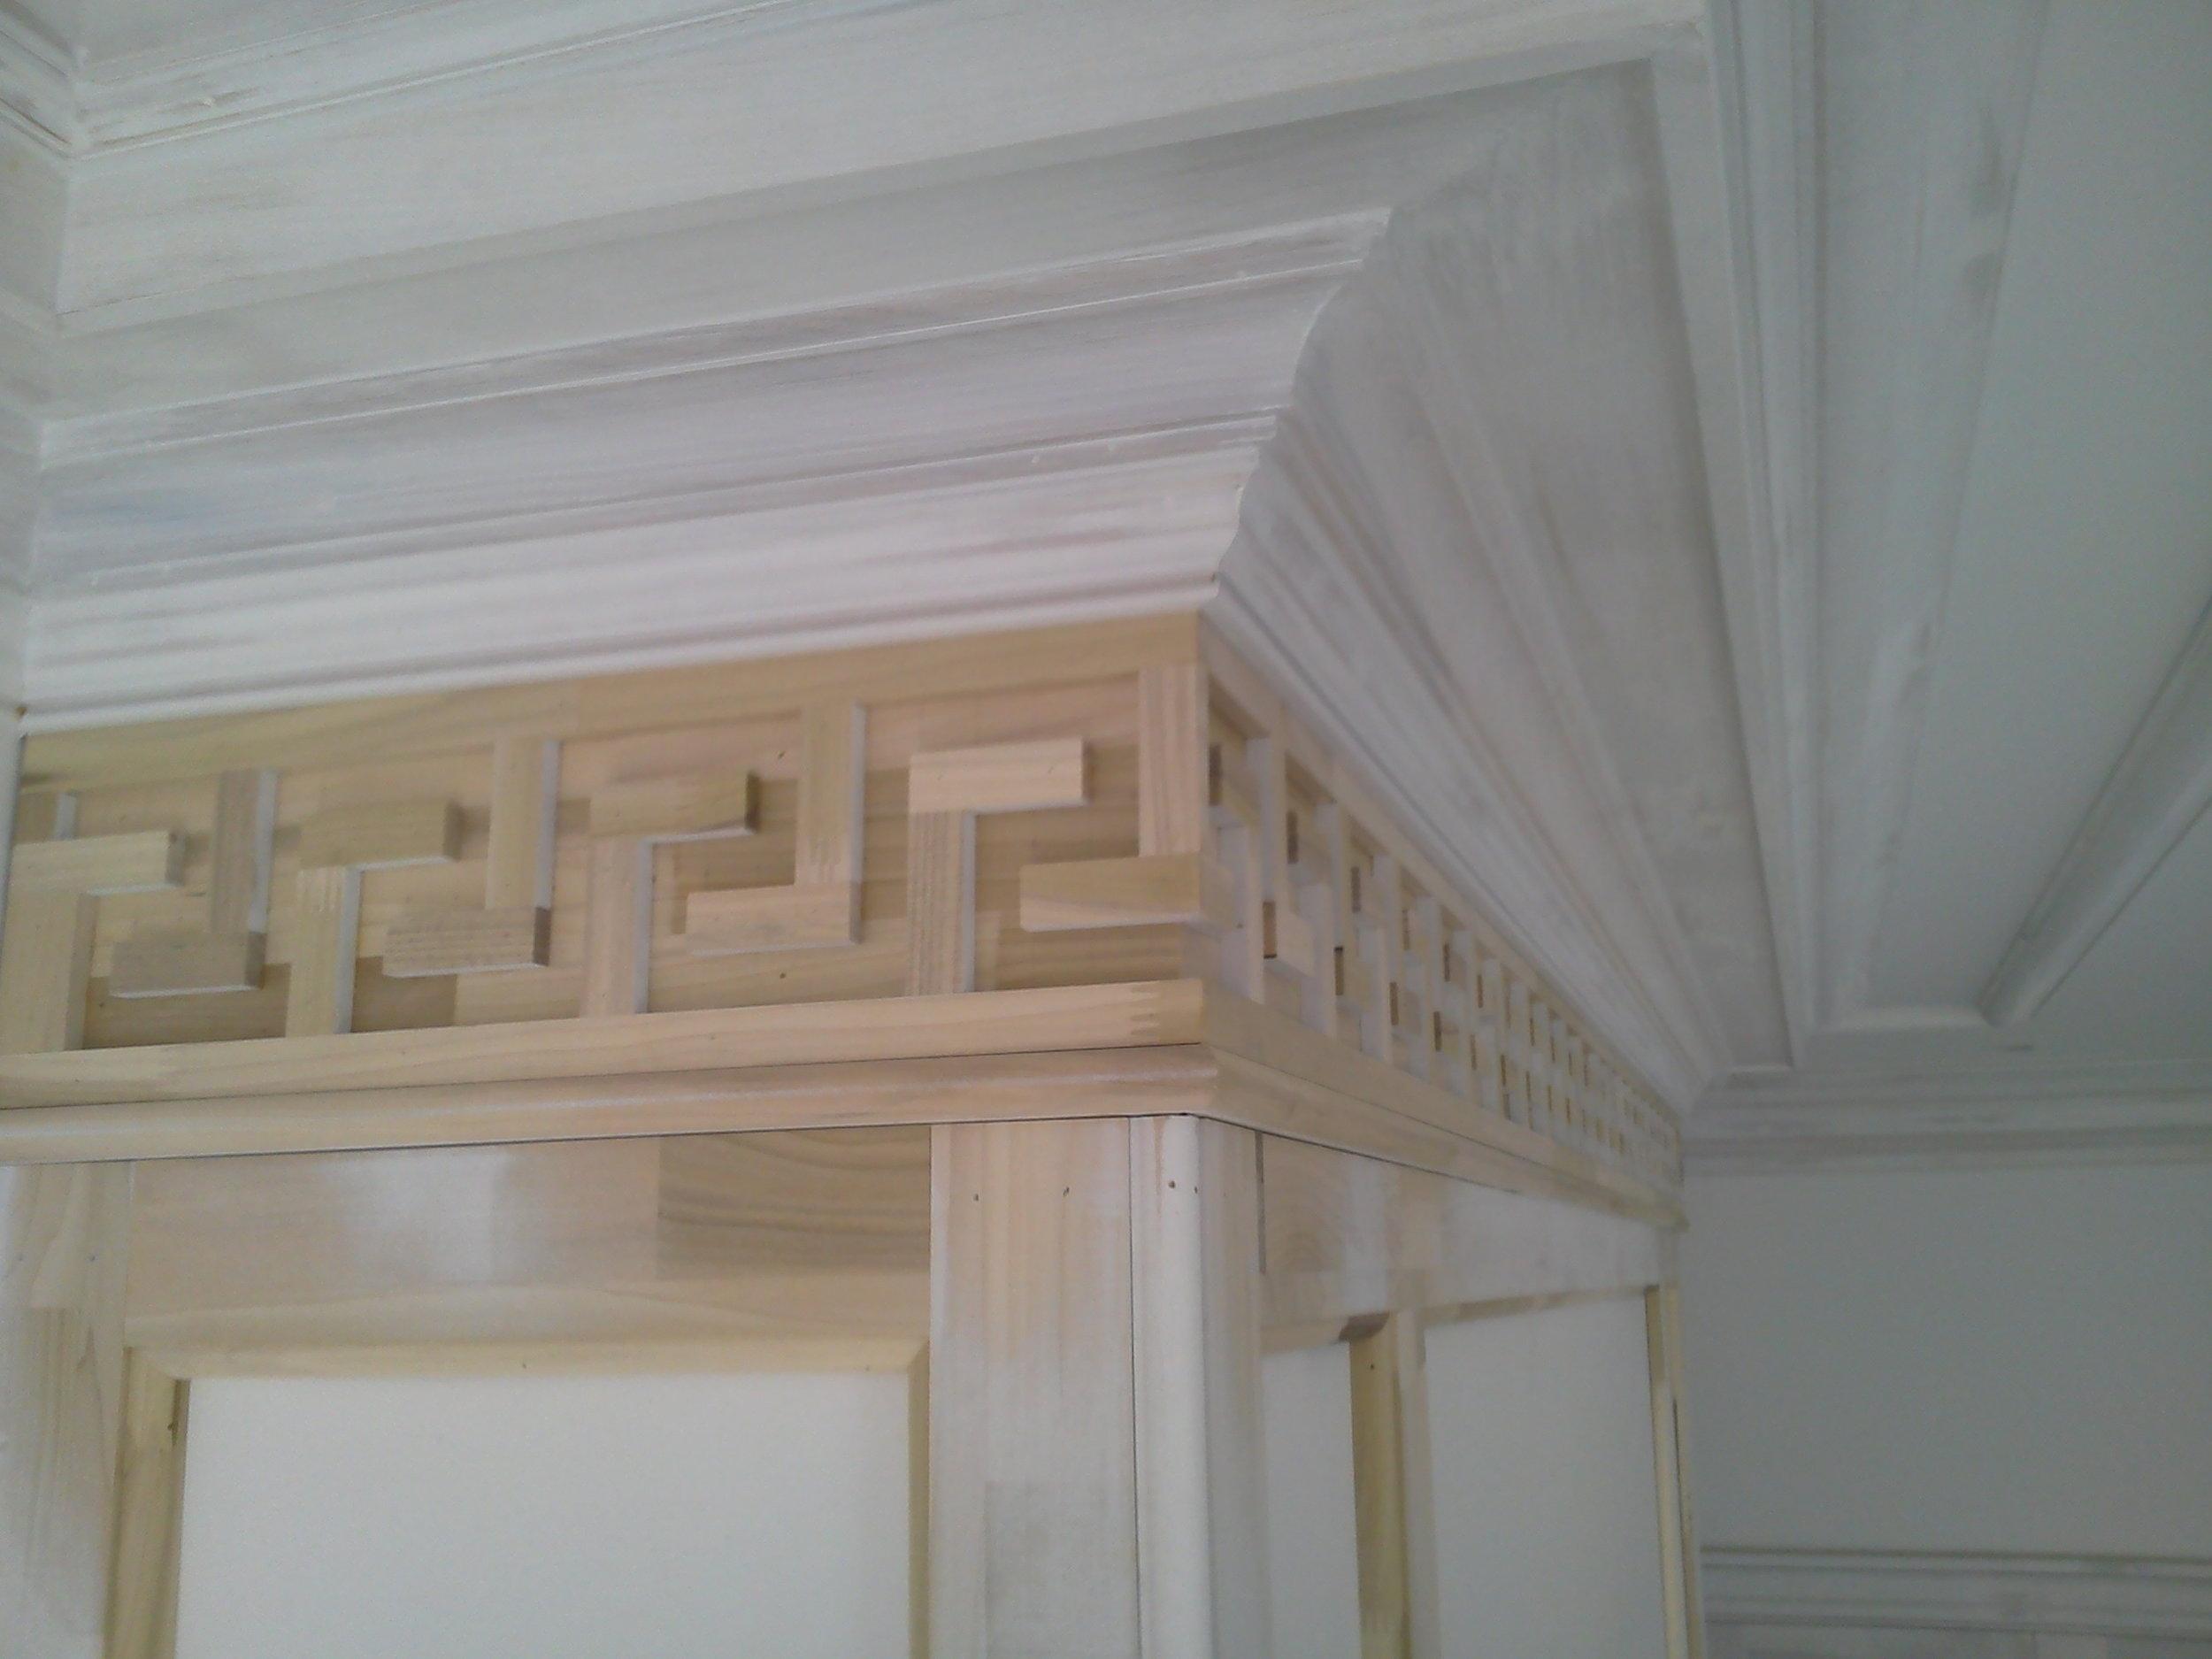 Closeup view of Greek Key Fireplace Surround